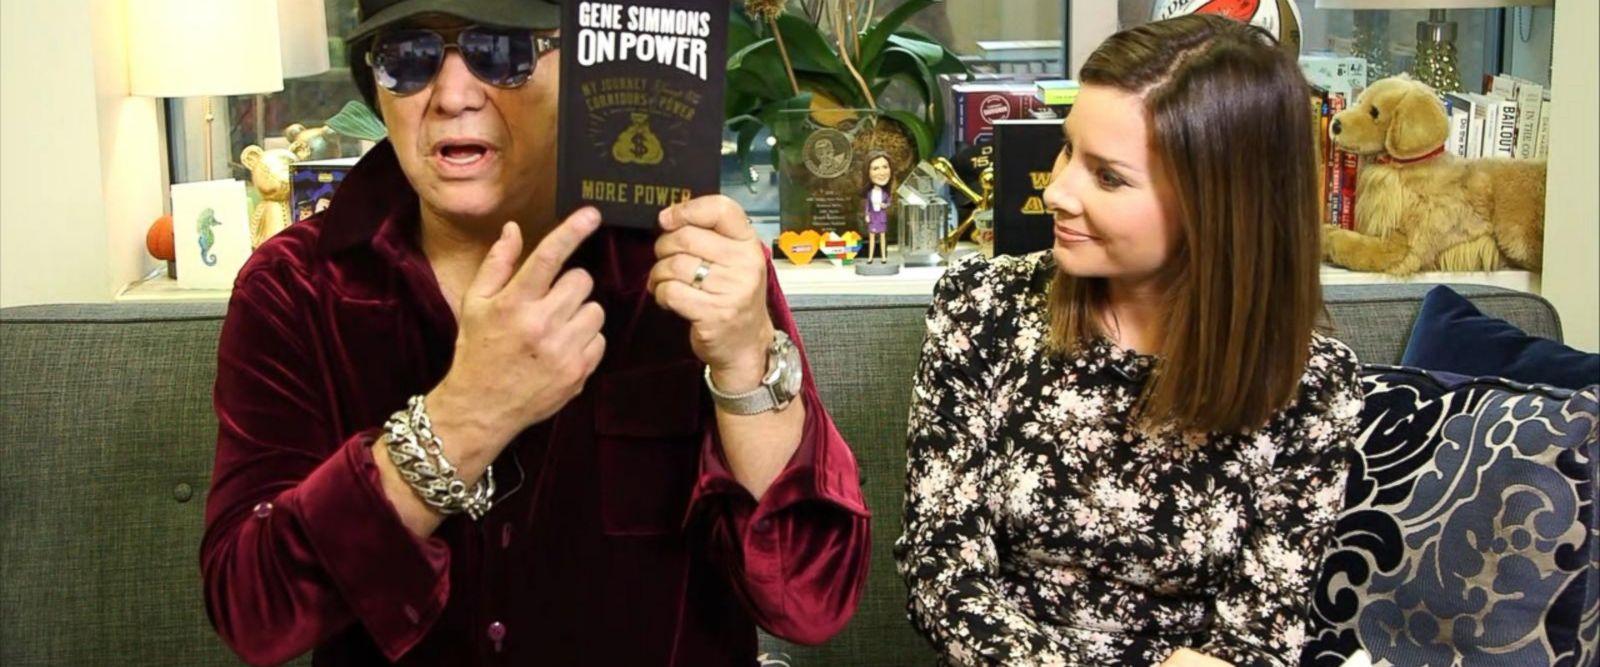 VIDEO: Gene Simmons on 'Real Biz'